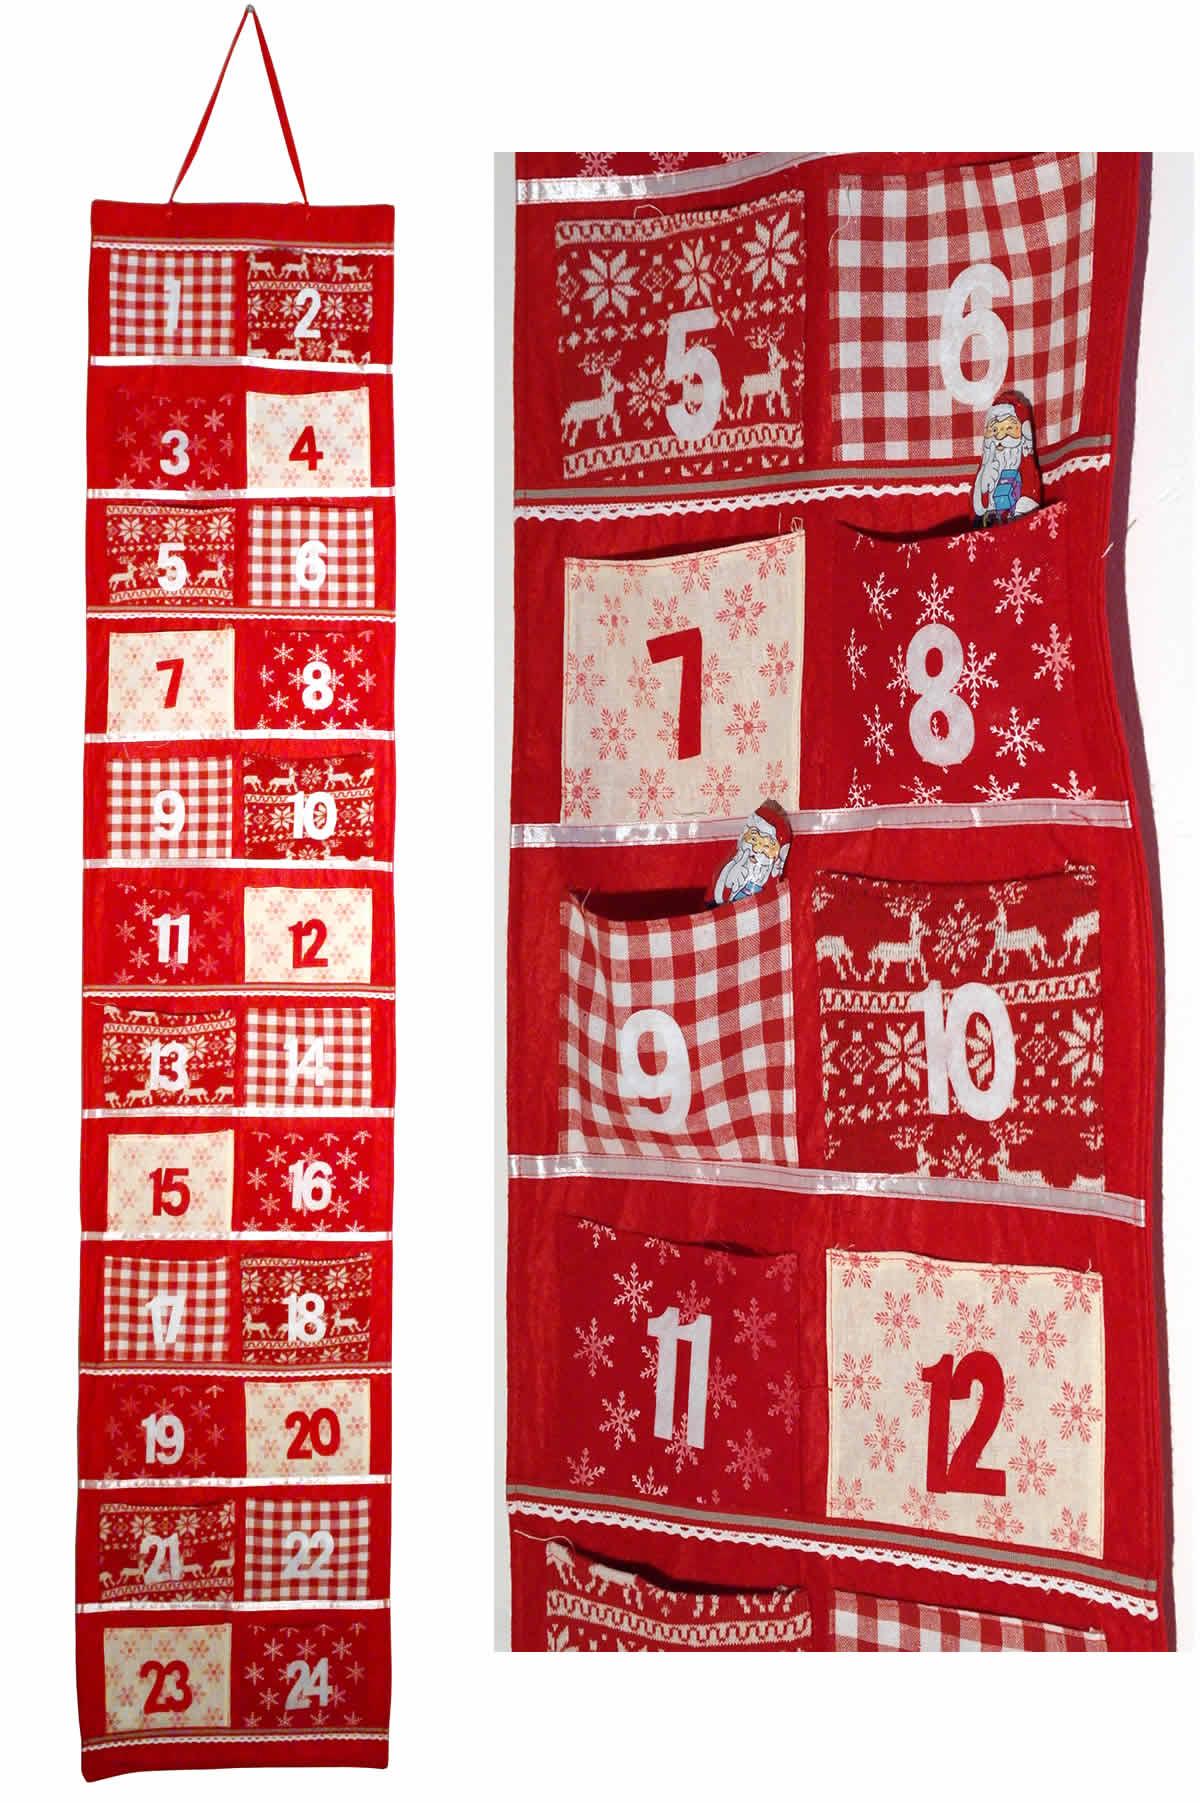 adventskalender selbstbef llen advent kalender girlande stern 24 s ckchen filz ebay. Black Bedroom Furniture Sets. Home Design Ideas